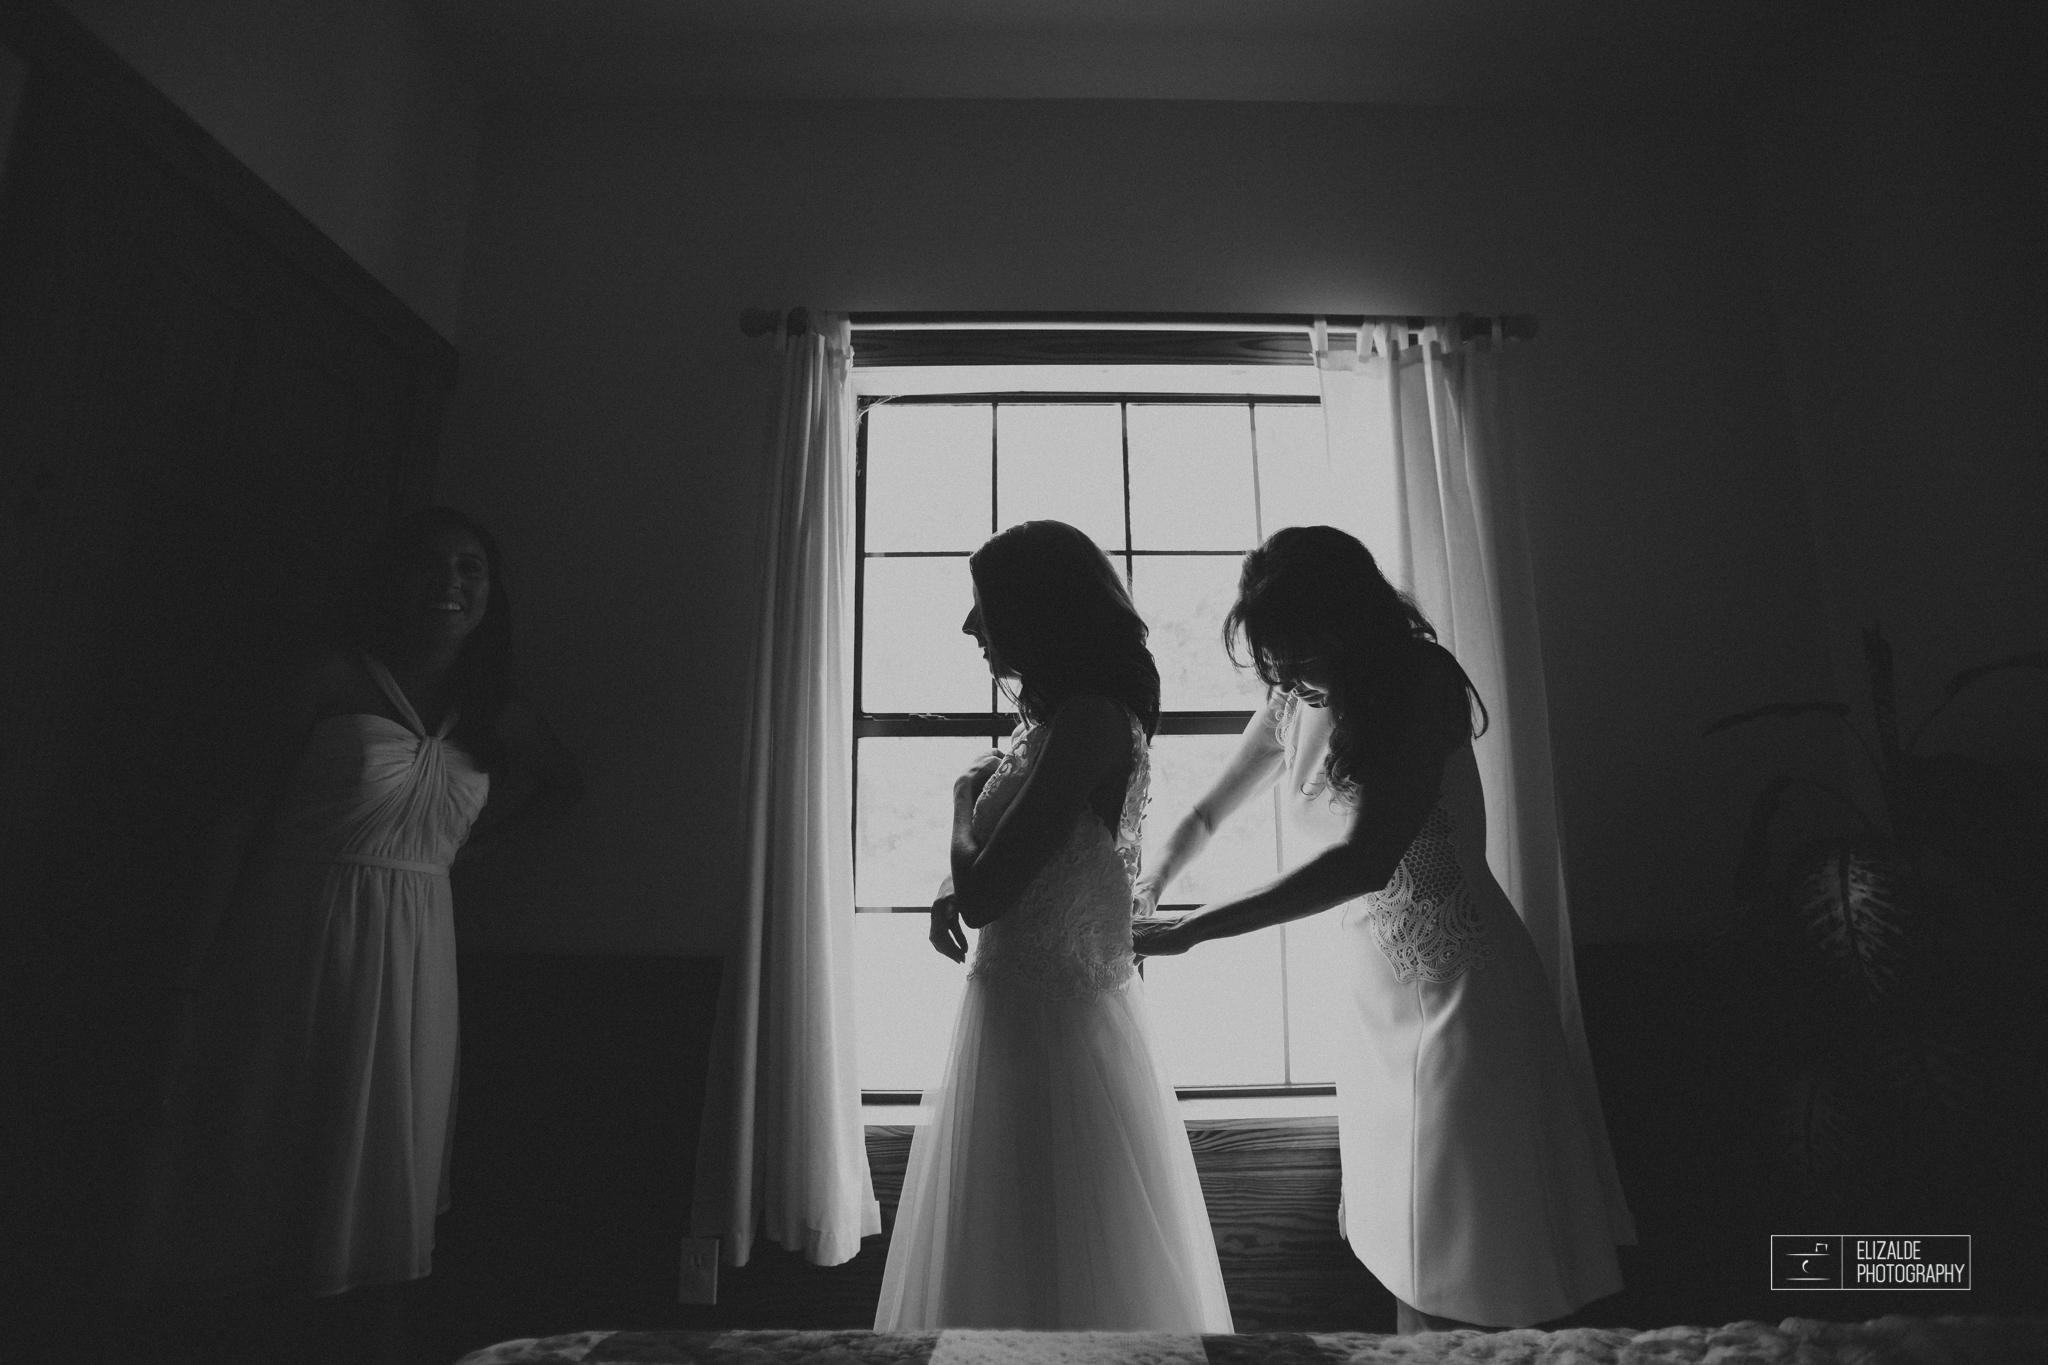 Wedding photographer Dallas_Elizalde Photography_DFW Wedding photographer_ Hickoty Hills_Wedding Photography (18 of 90).jpg